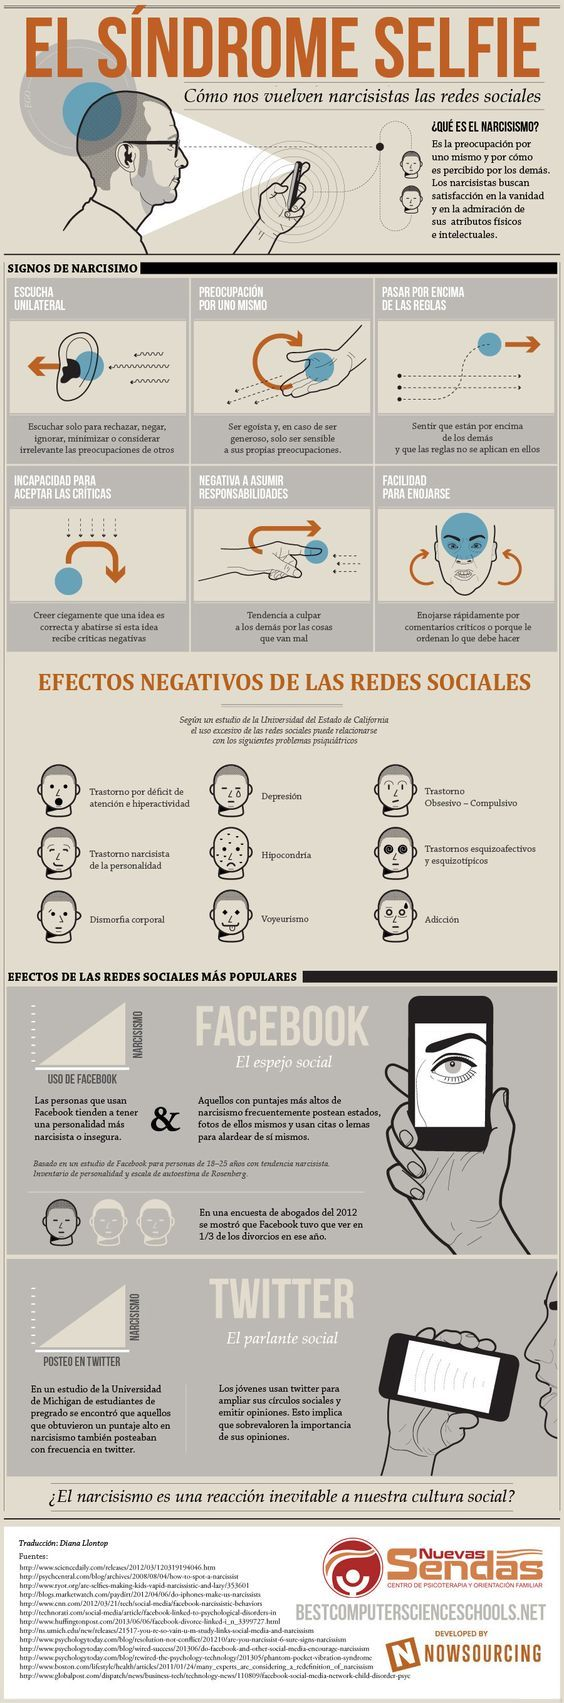 El síndrome selfie #infografia: